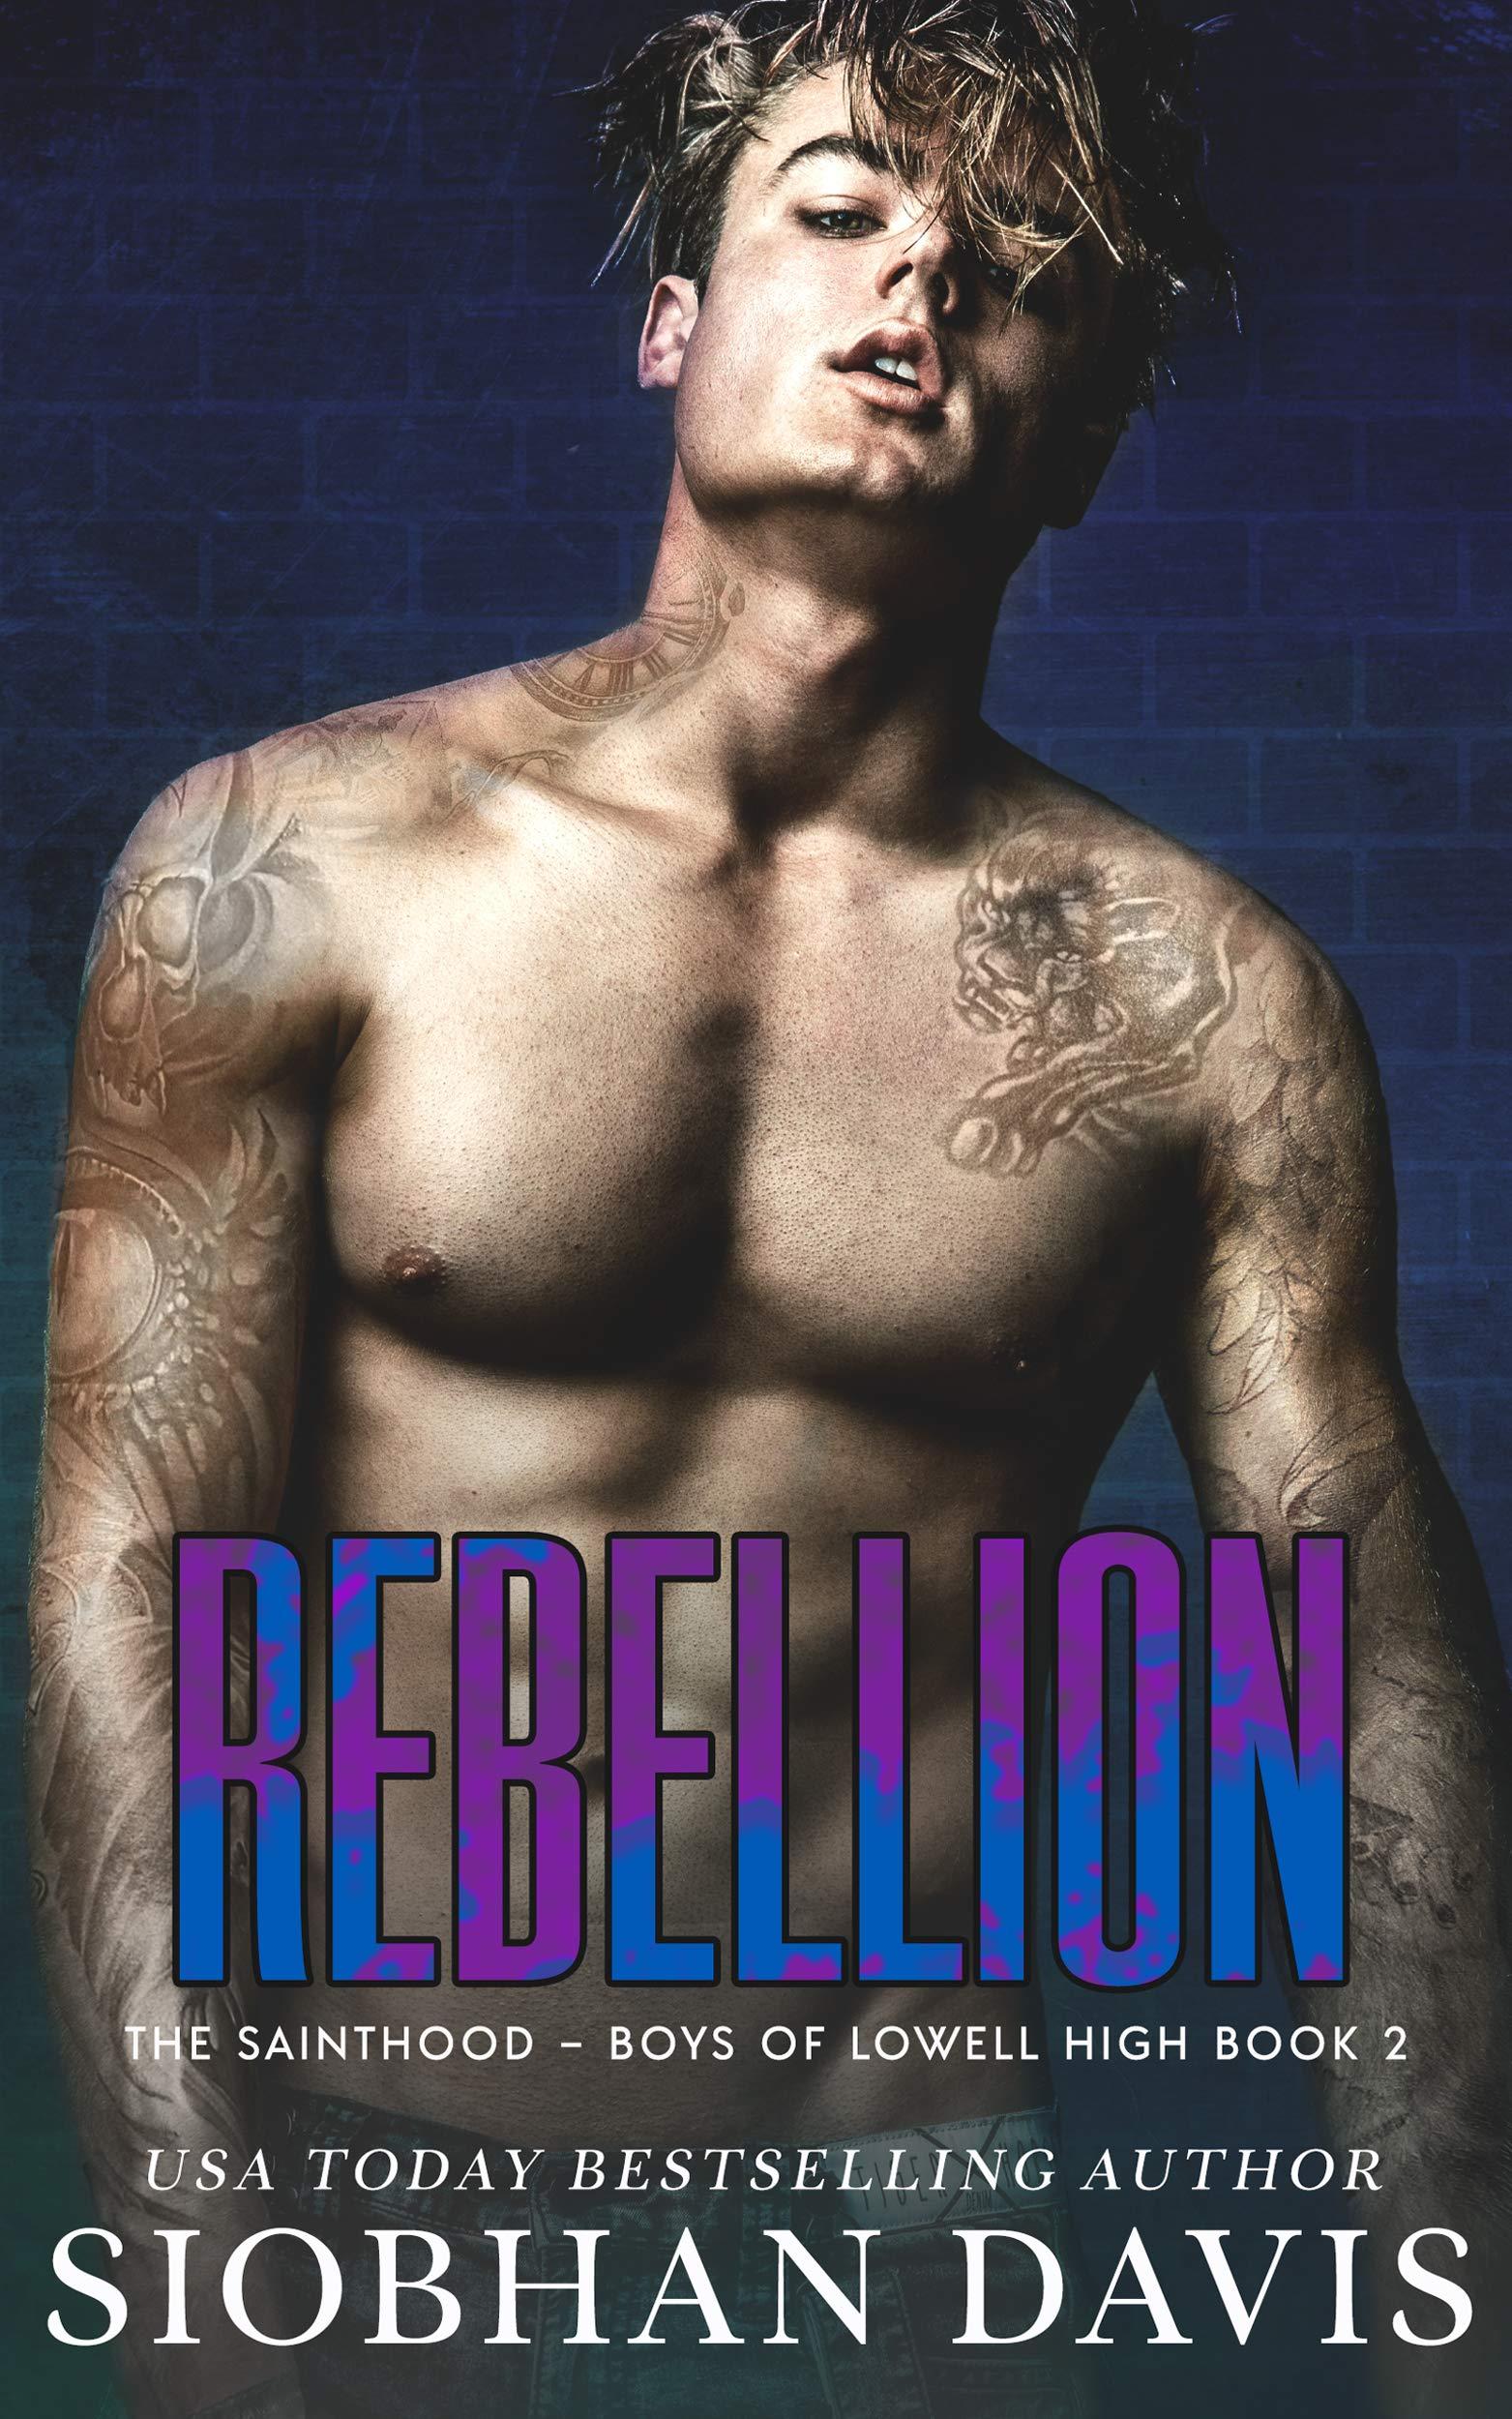 Rebellion: A Dark High School Romance (The Sainthood - Boys of Lowell High Book 2)